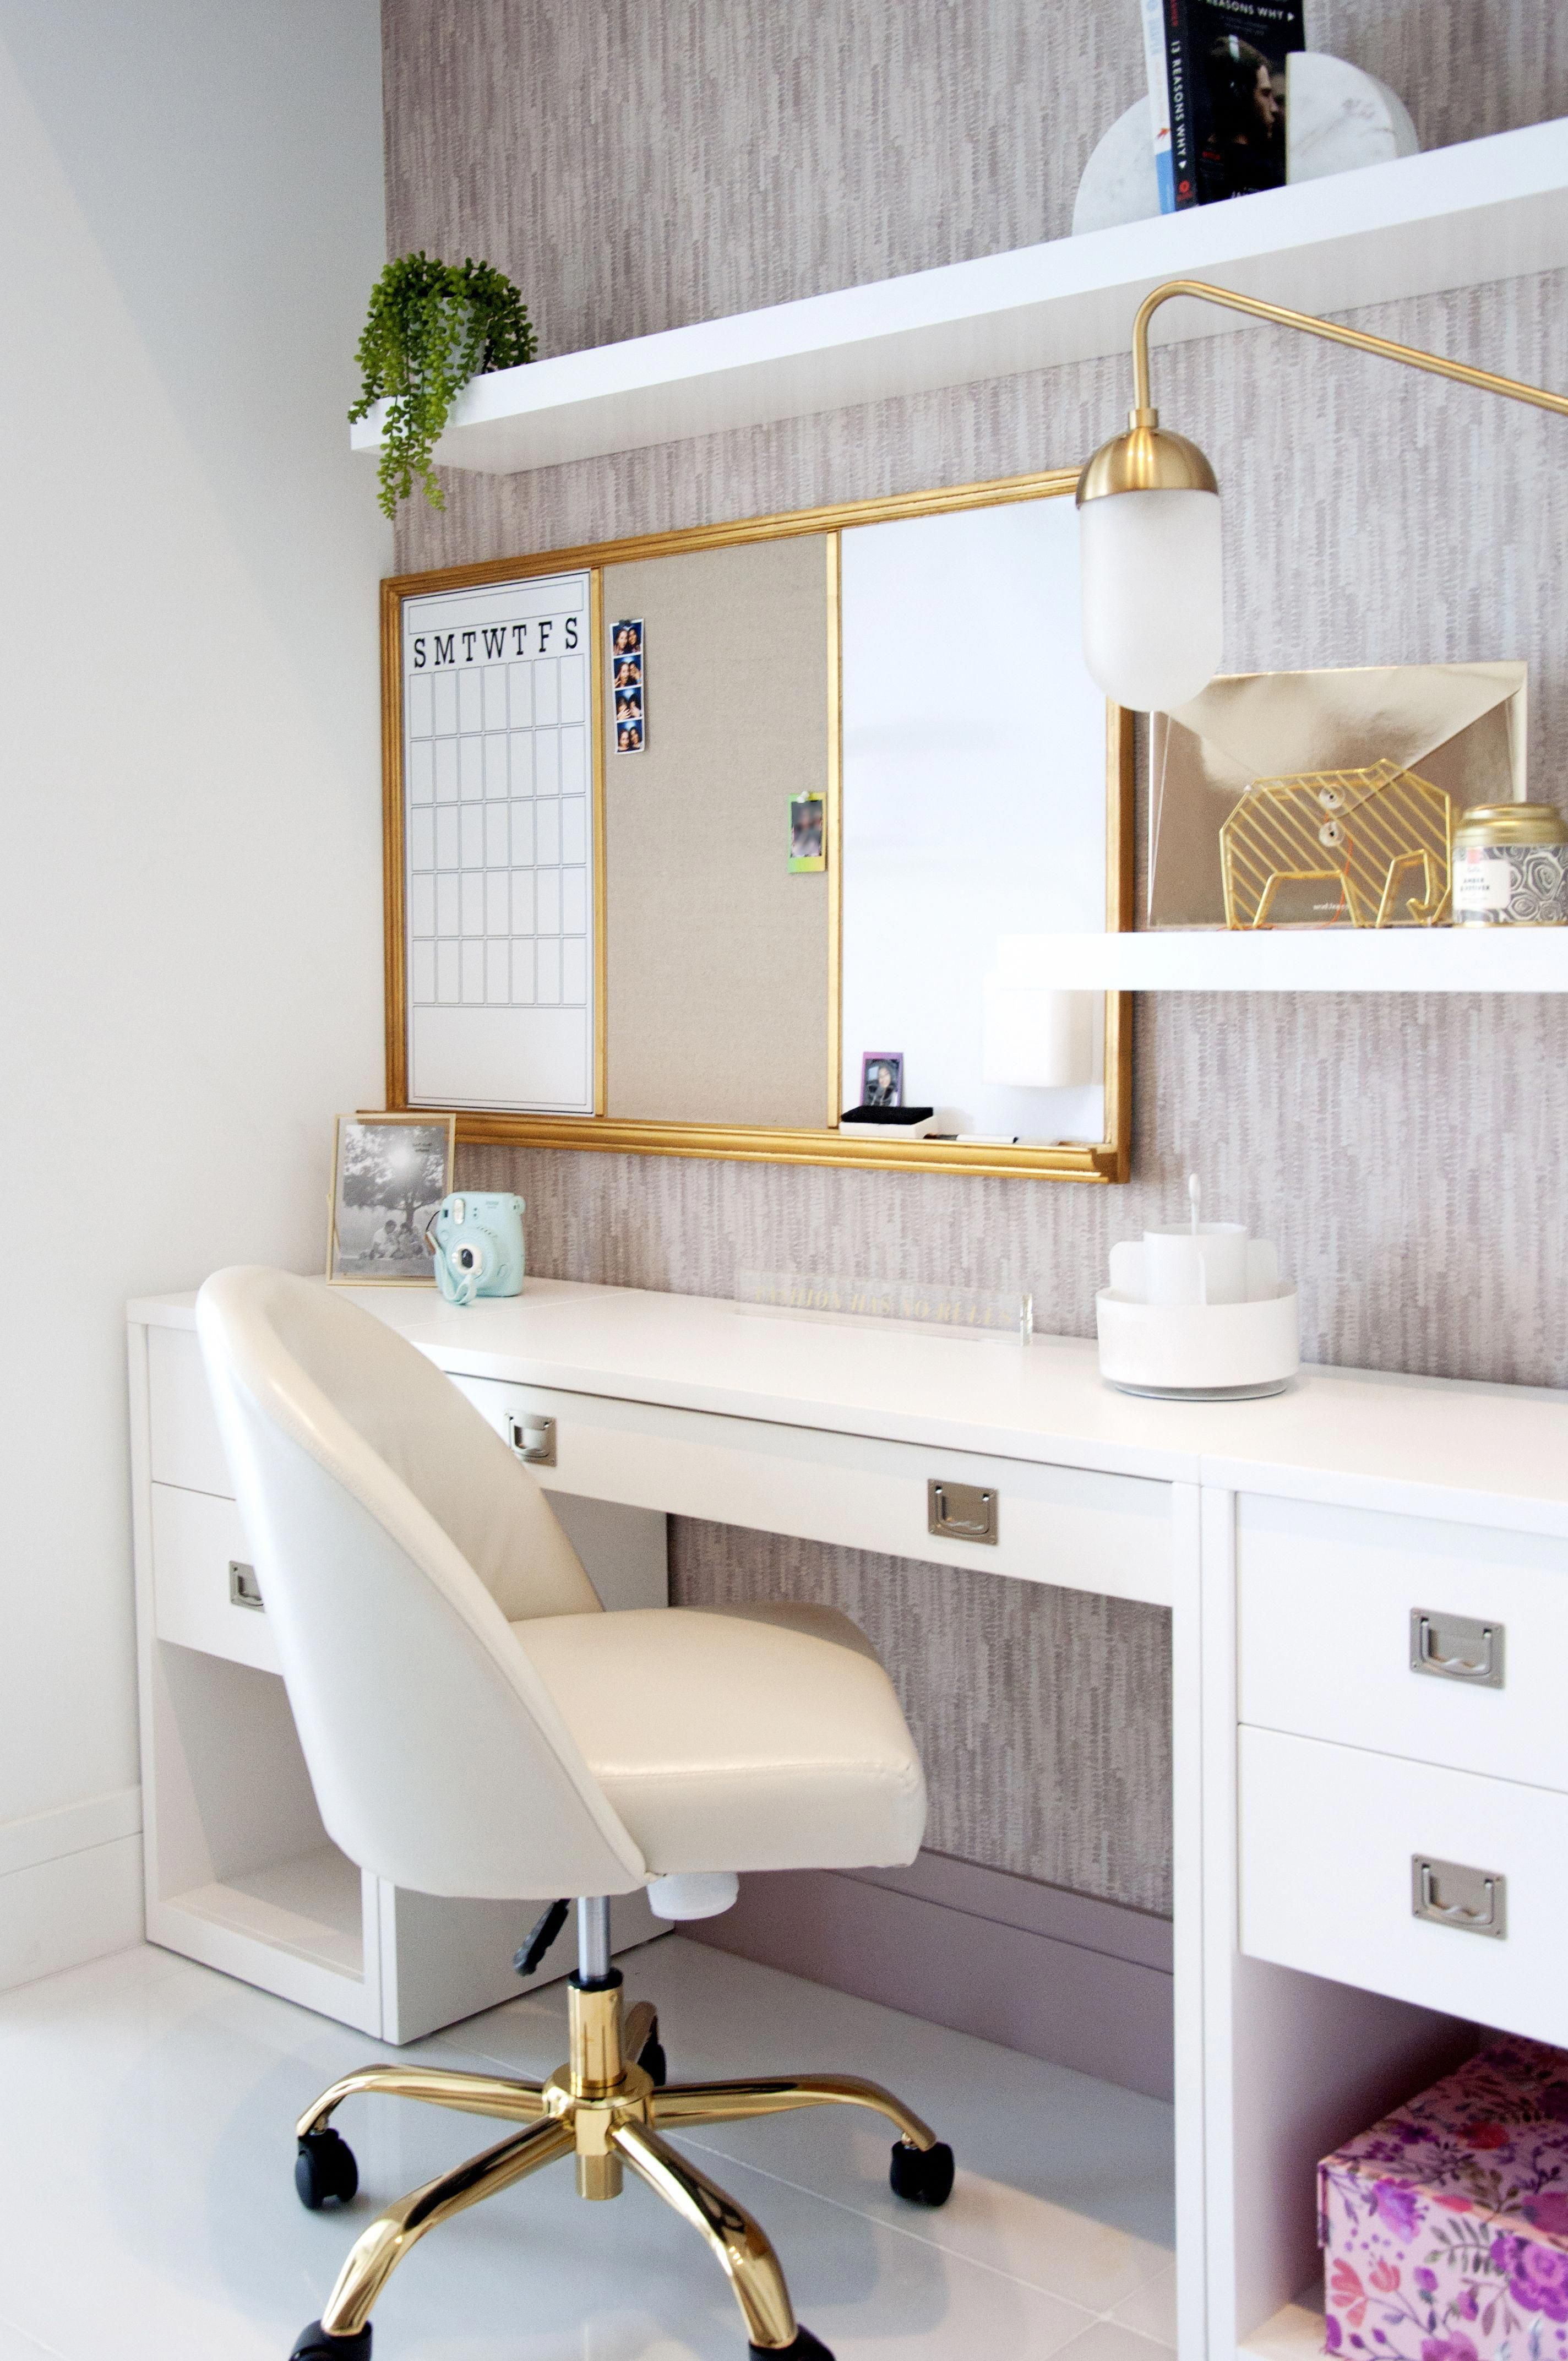 Get More Ideas On Remodel Bathroom Remodelinghouseideas